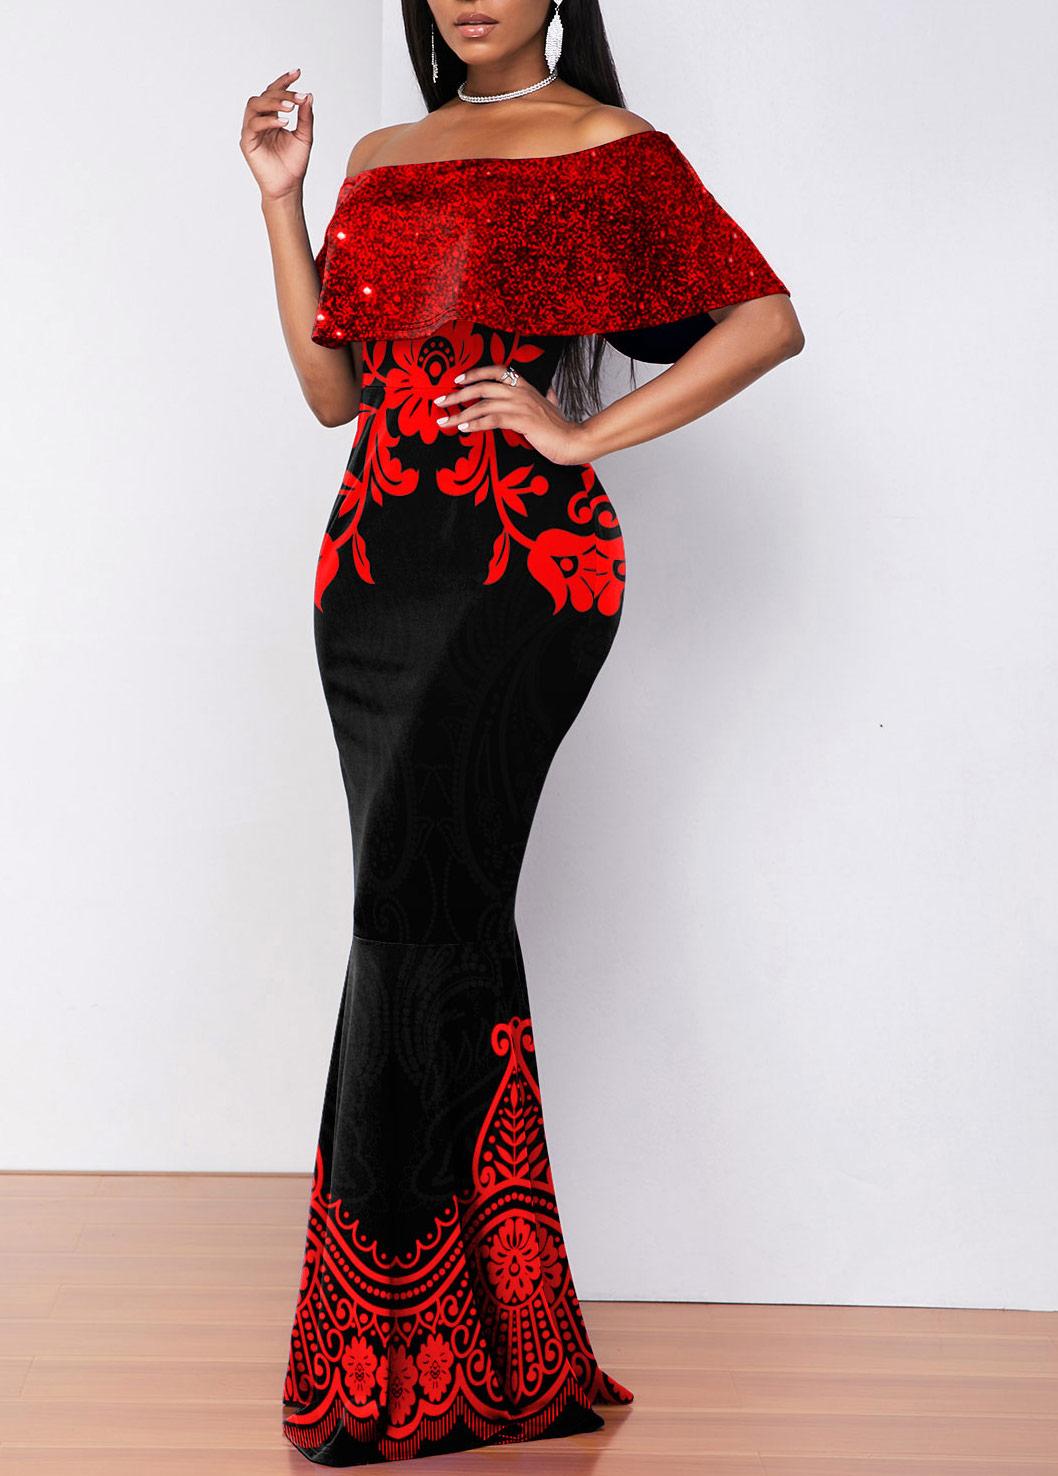 Floral Print Off Shoulder Sequin Overlay Mermaid Dress